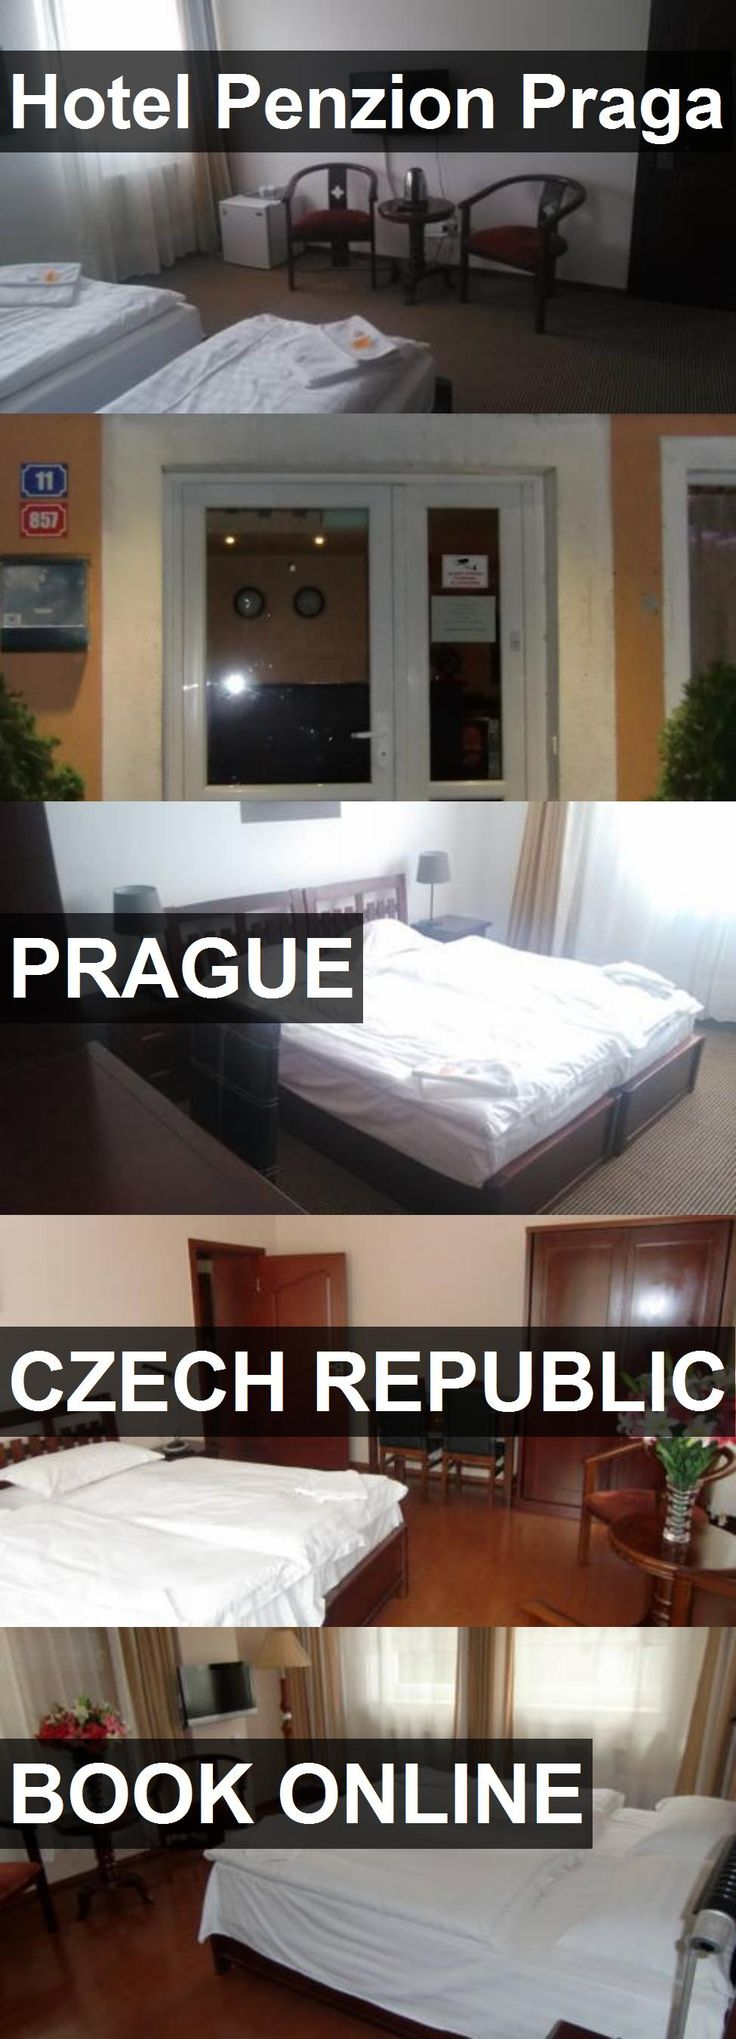 Hotel Penzion Praga in Prague, Czech Republic. For more information, photos, reviews and best prices please follow the link. #CzechRepublic #Prague #travel #vacation #hotel